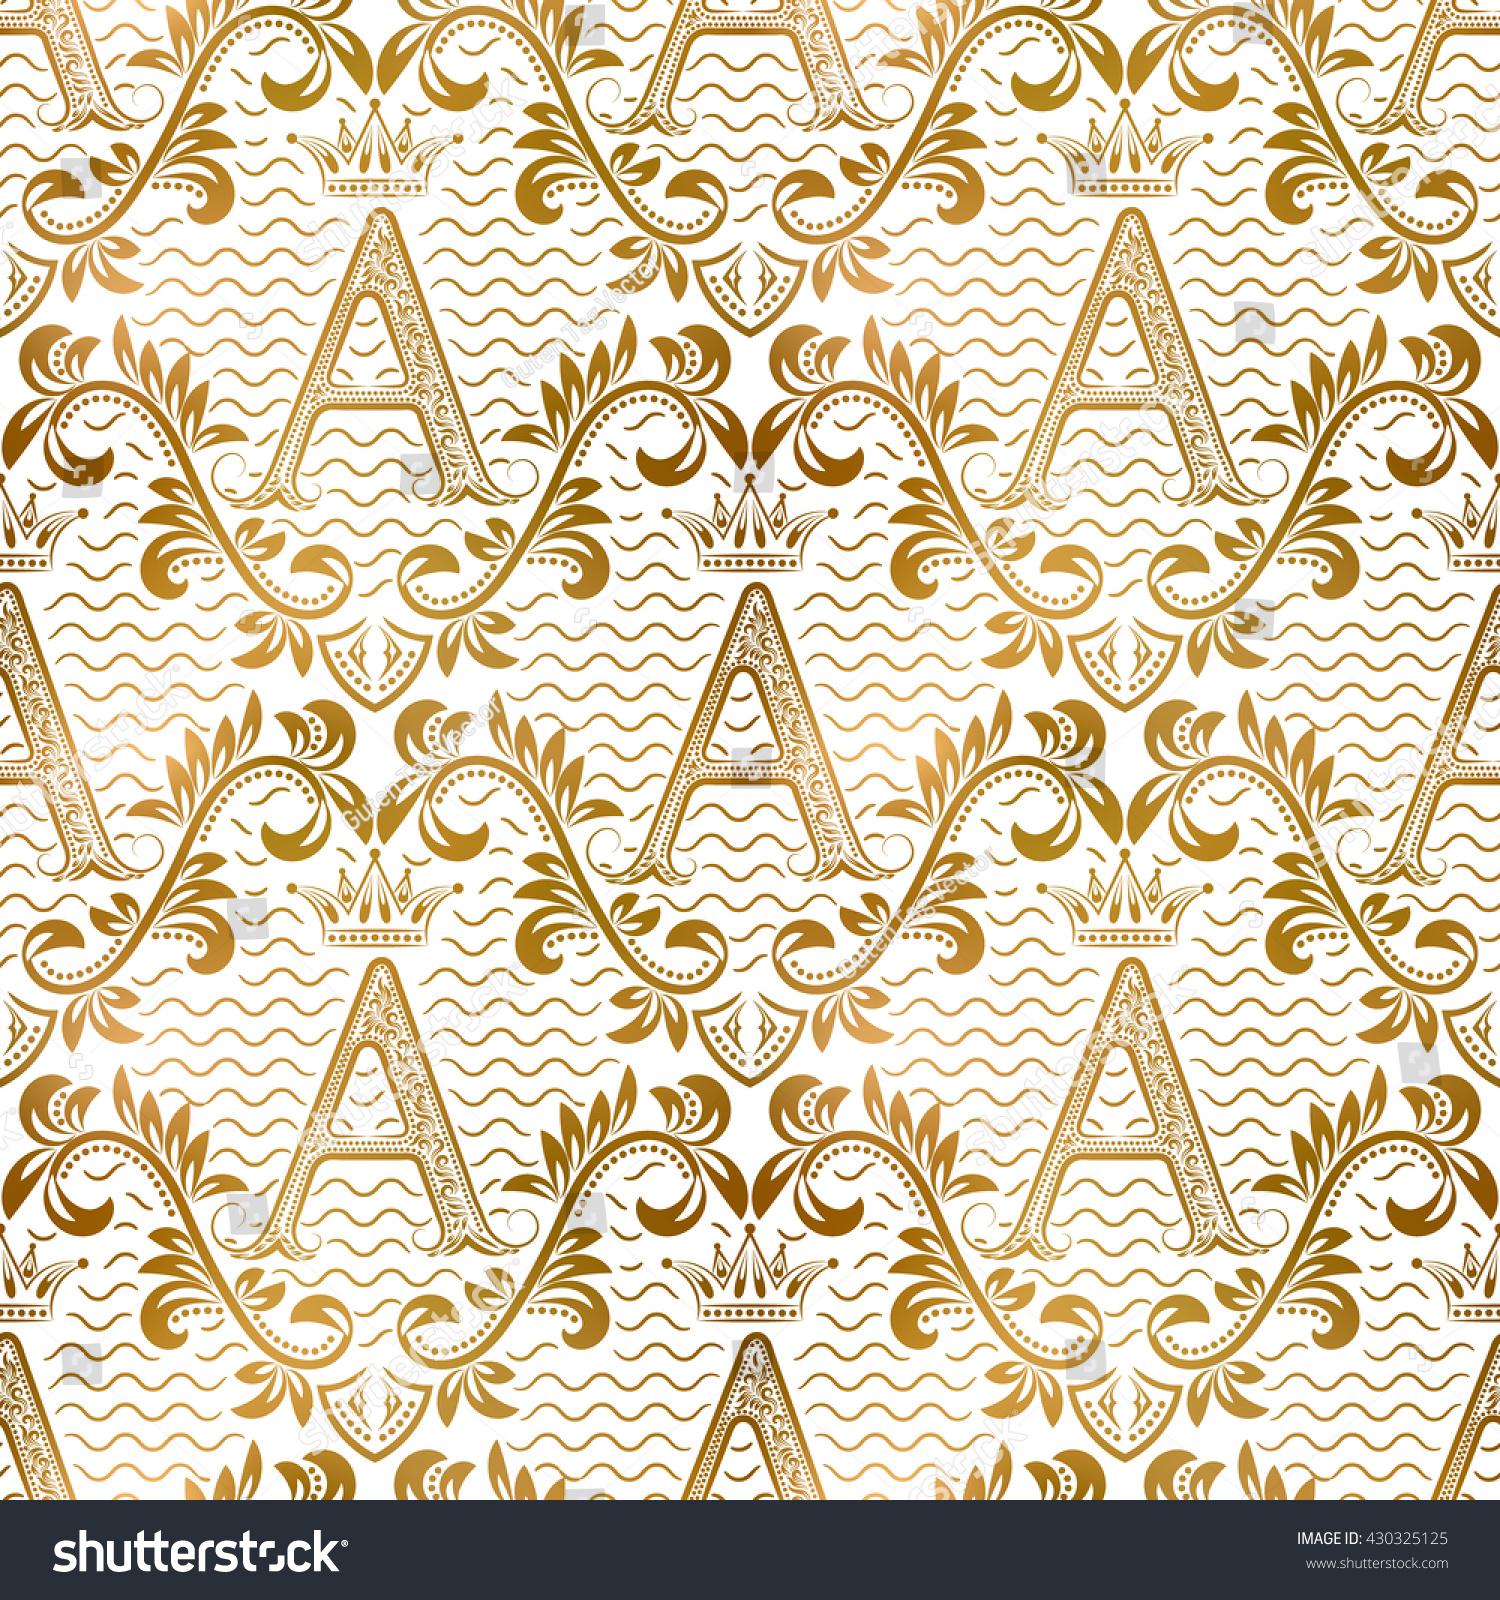 Golden White Vintage Seamless Pattern Gold Stock Vector